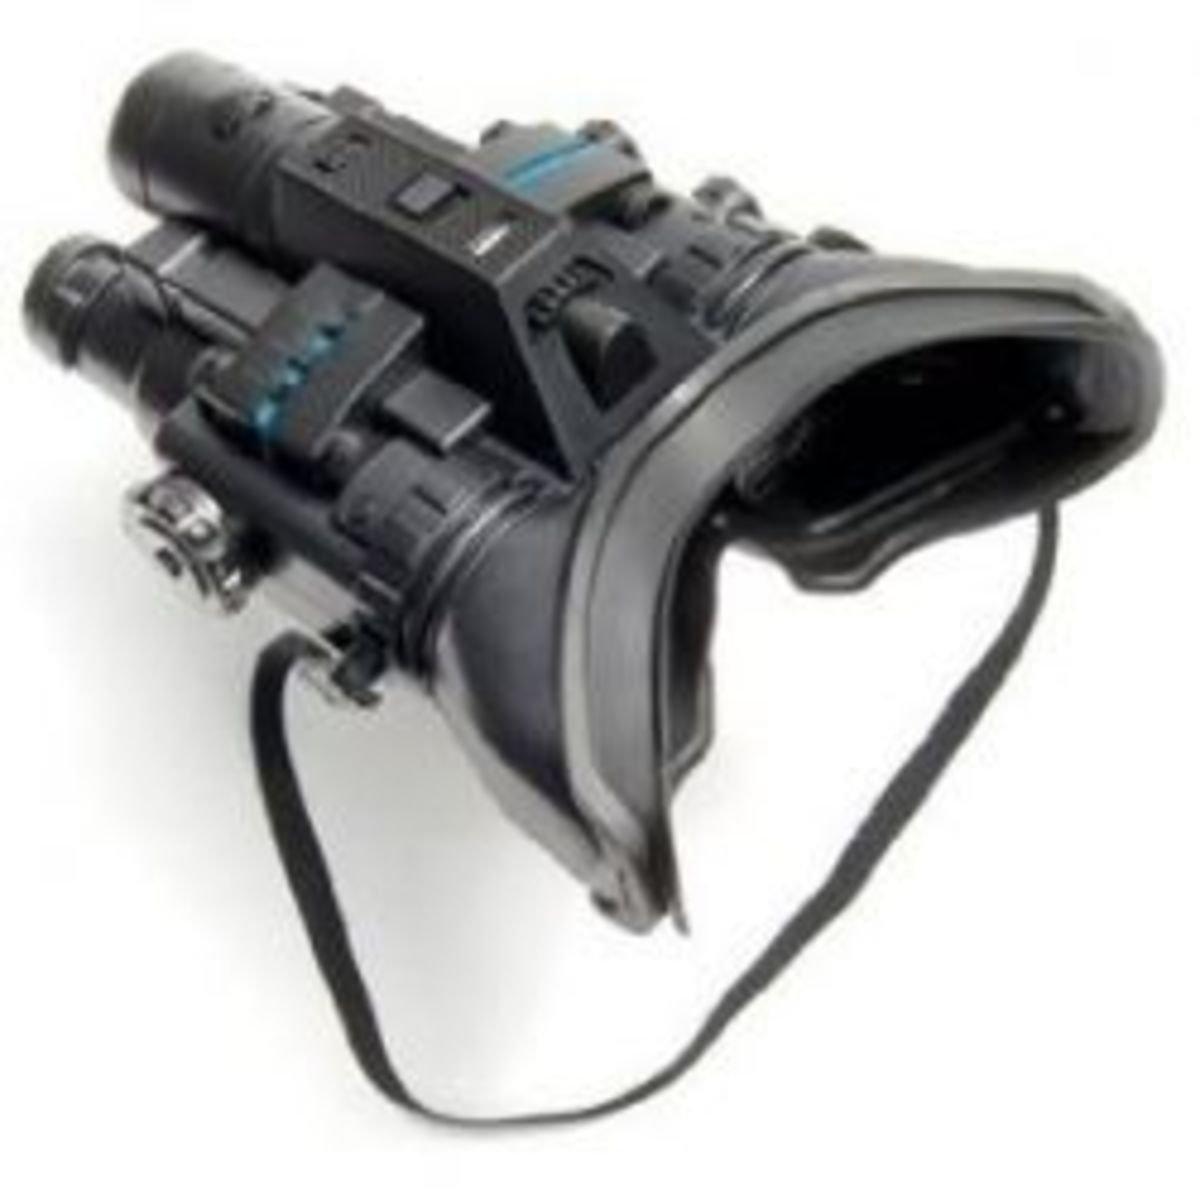 1c591d0674cb0 Spy Net